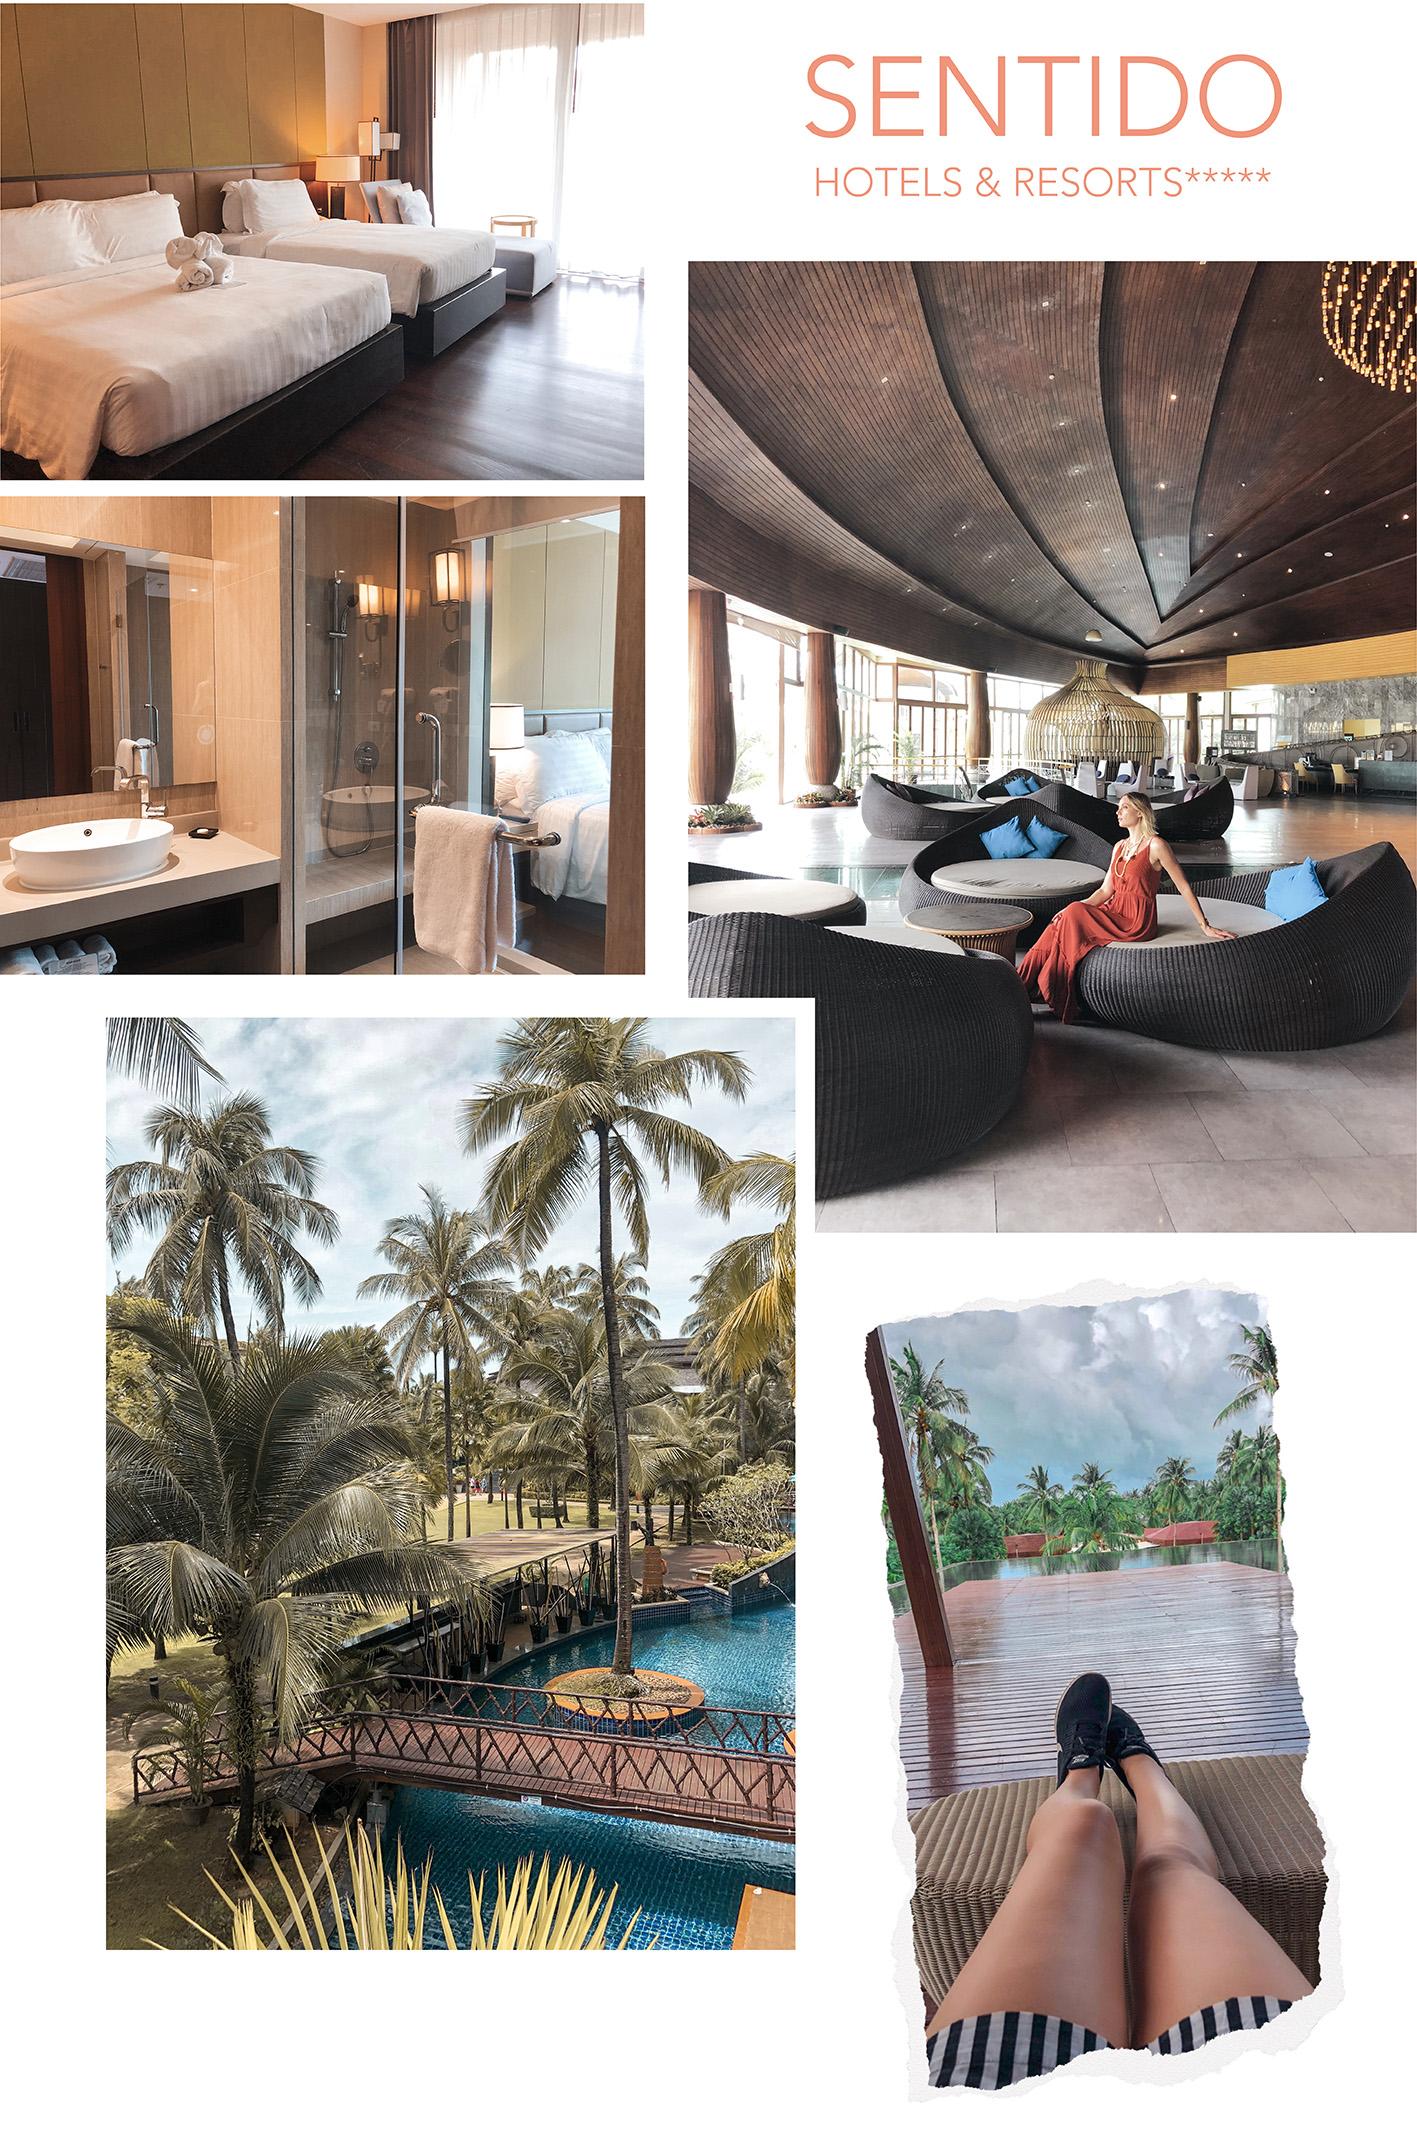 kappa-club-thailande-hotels-sentido